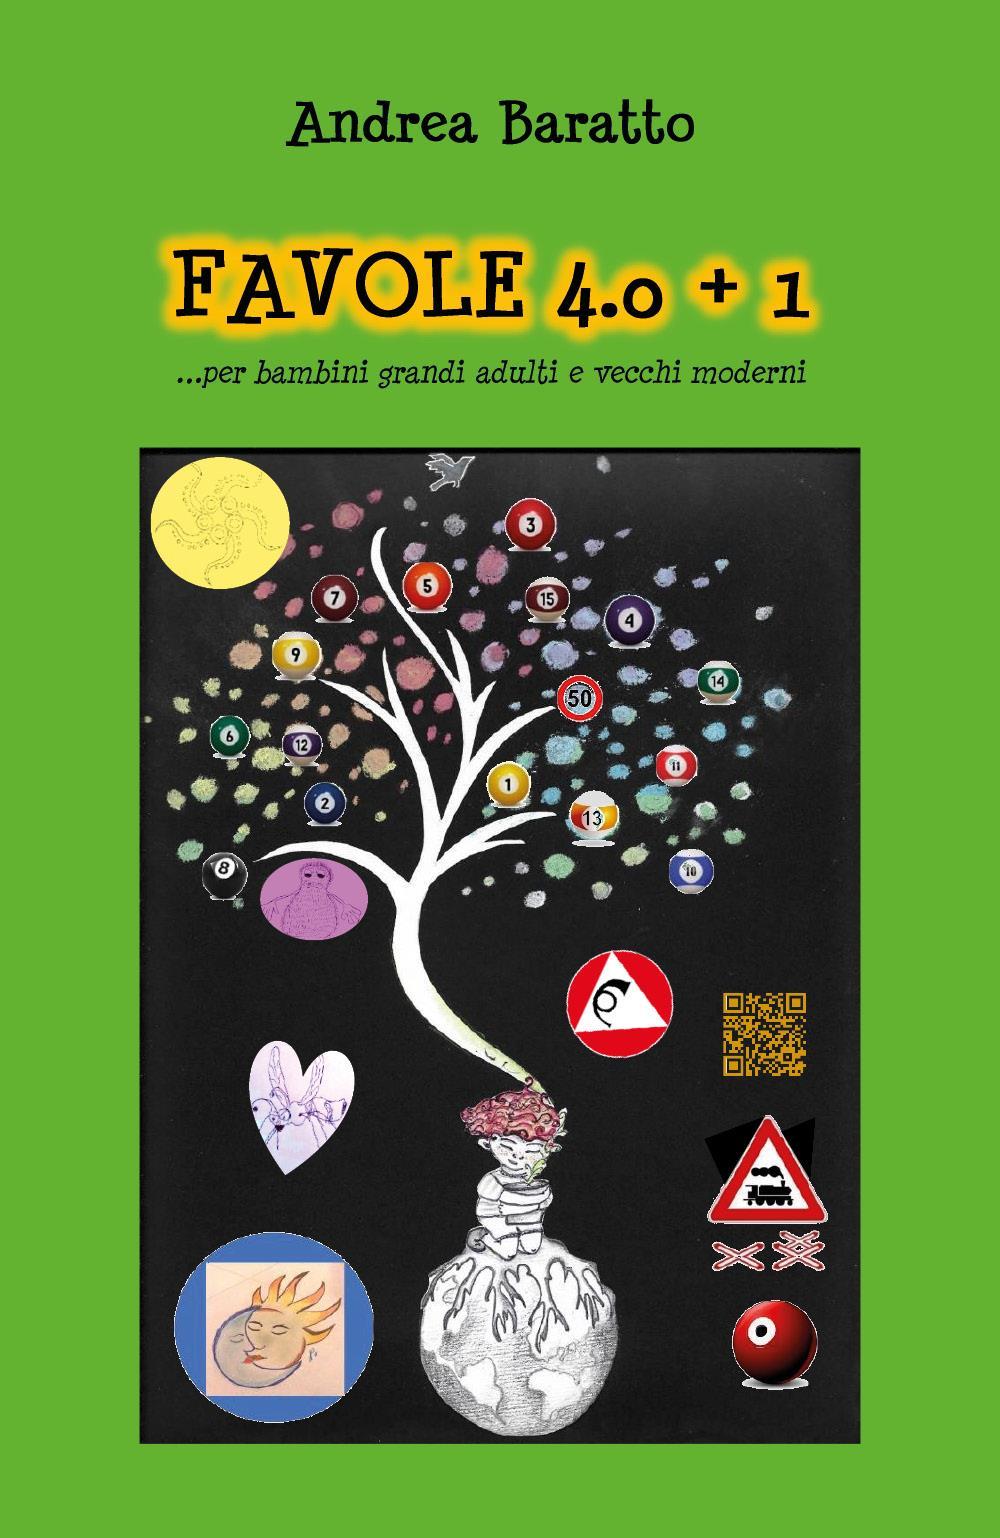 Favole 4.0+1